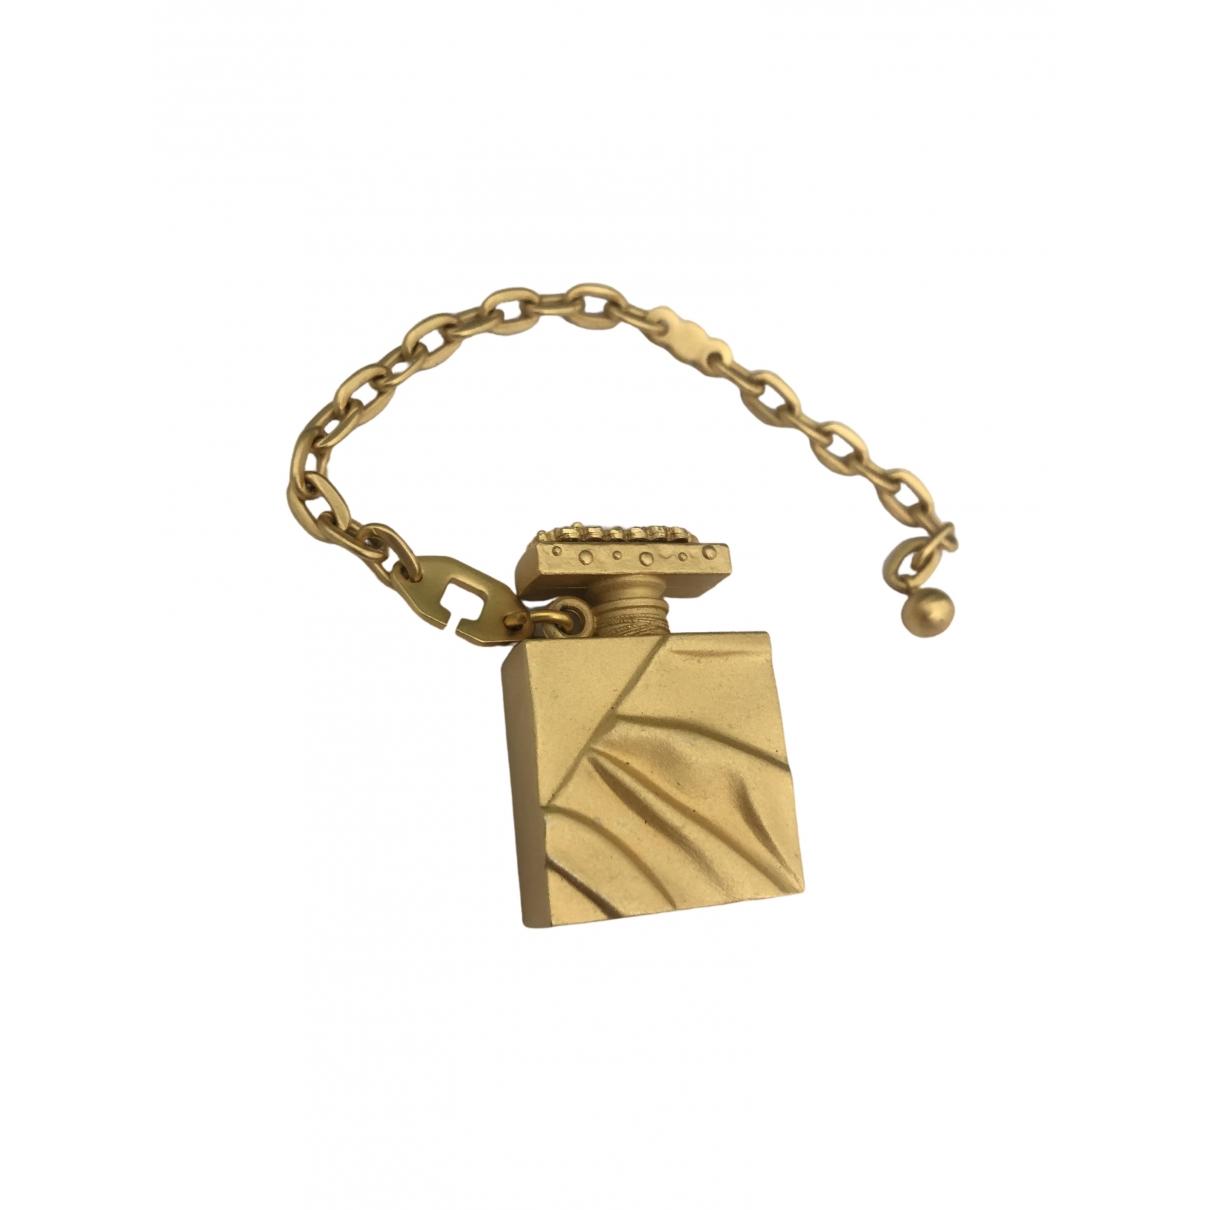 Balenciaga \N Taschenschmuck in  Gold Metall